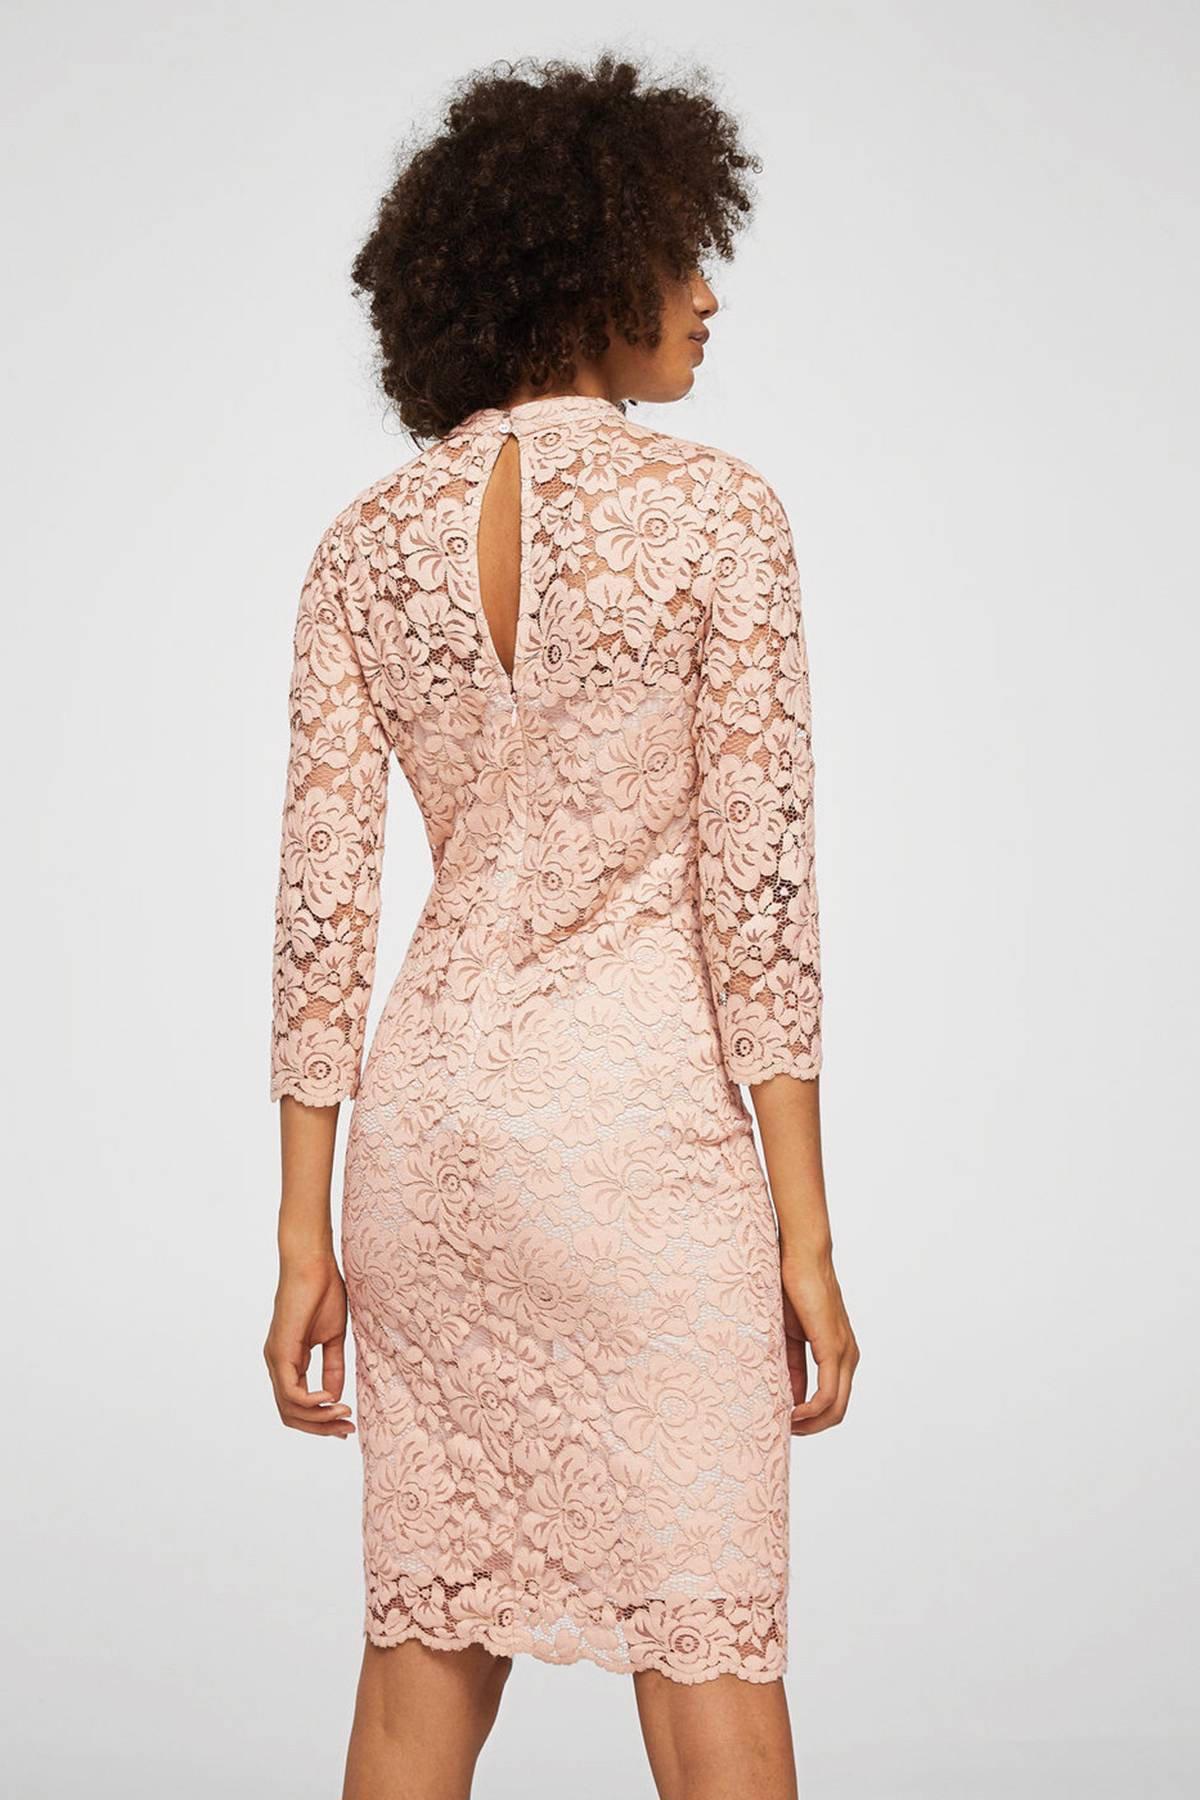 Spiksplinternieuw Mango kanten jurk | wehkamp TP-13